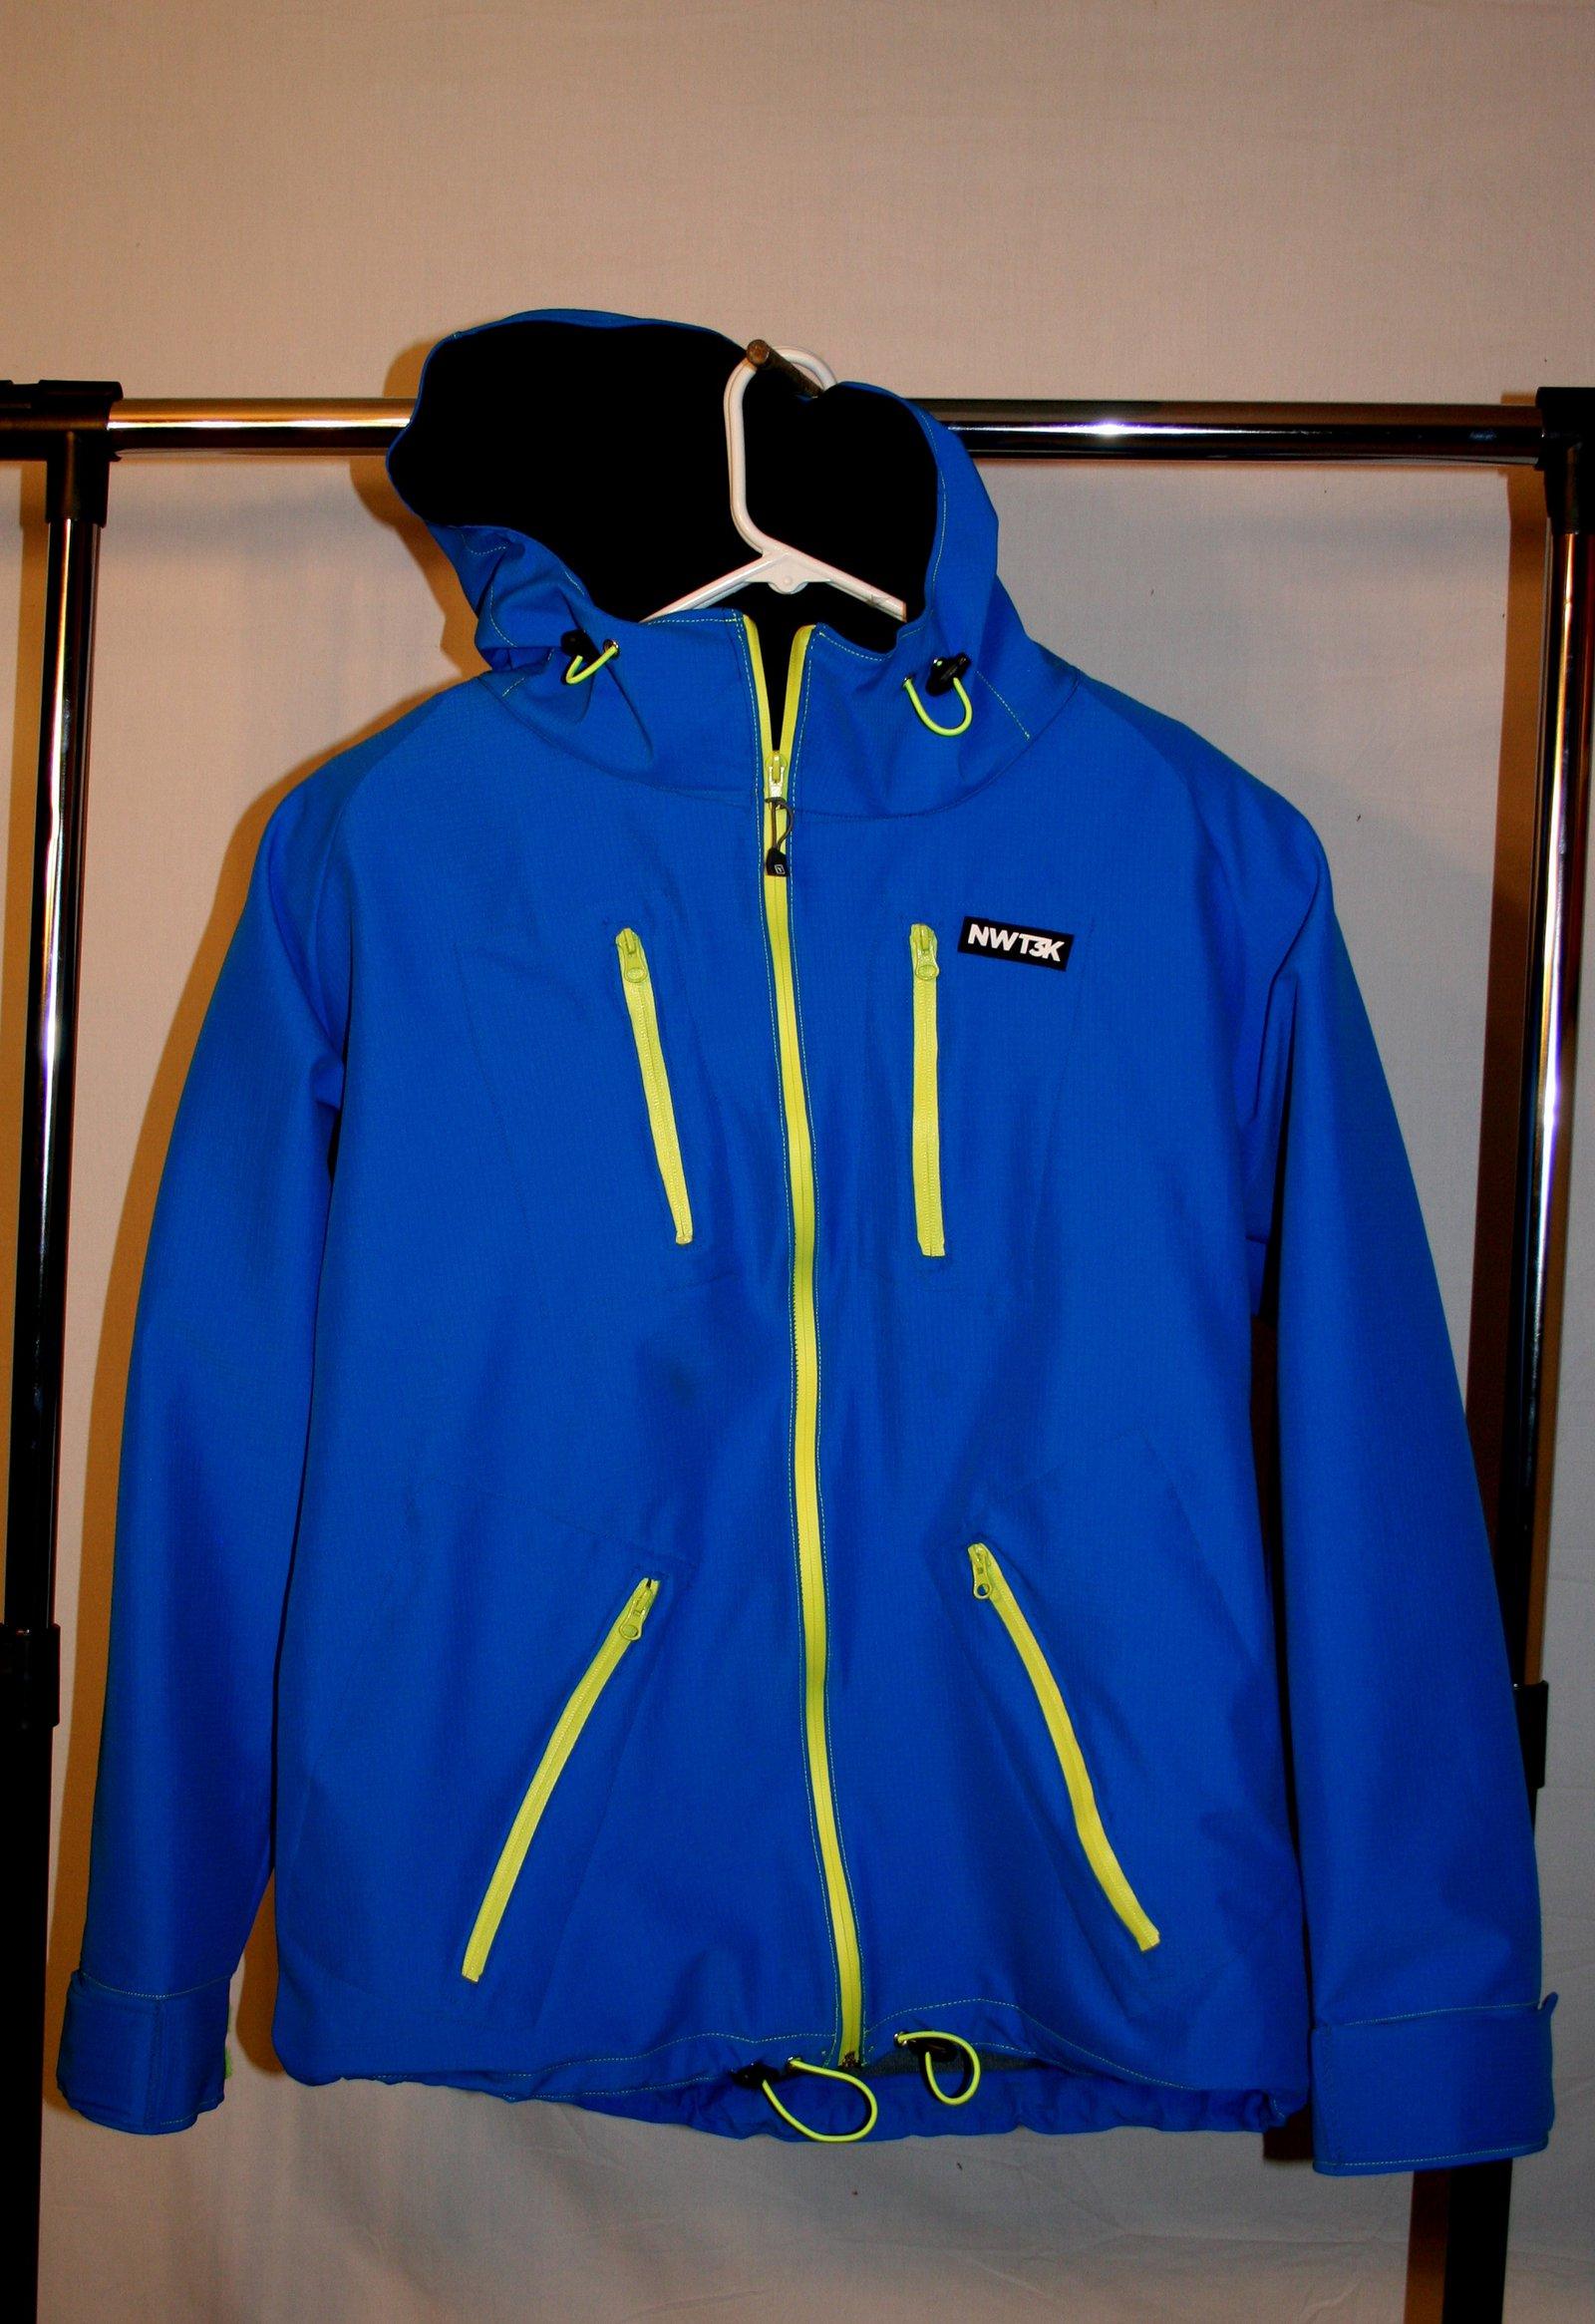 NWT3K Outerwear